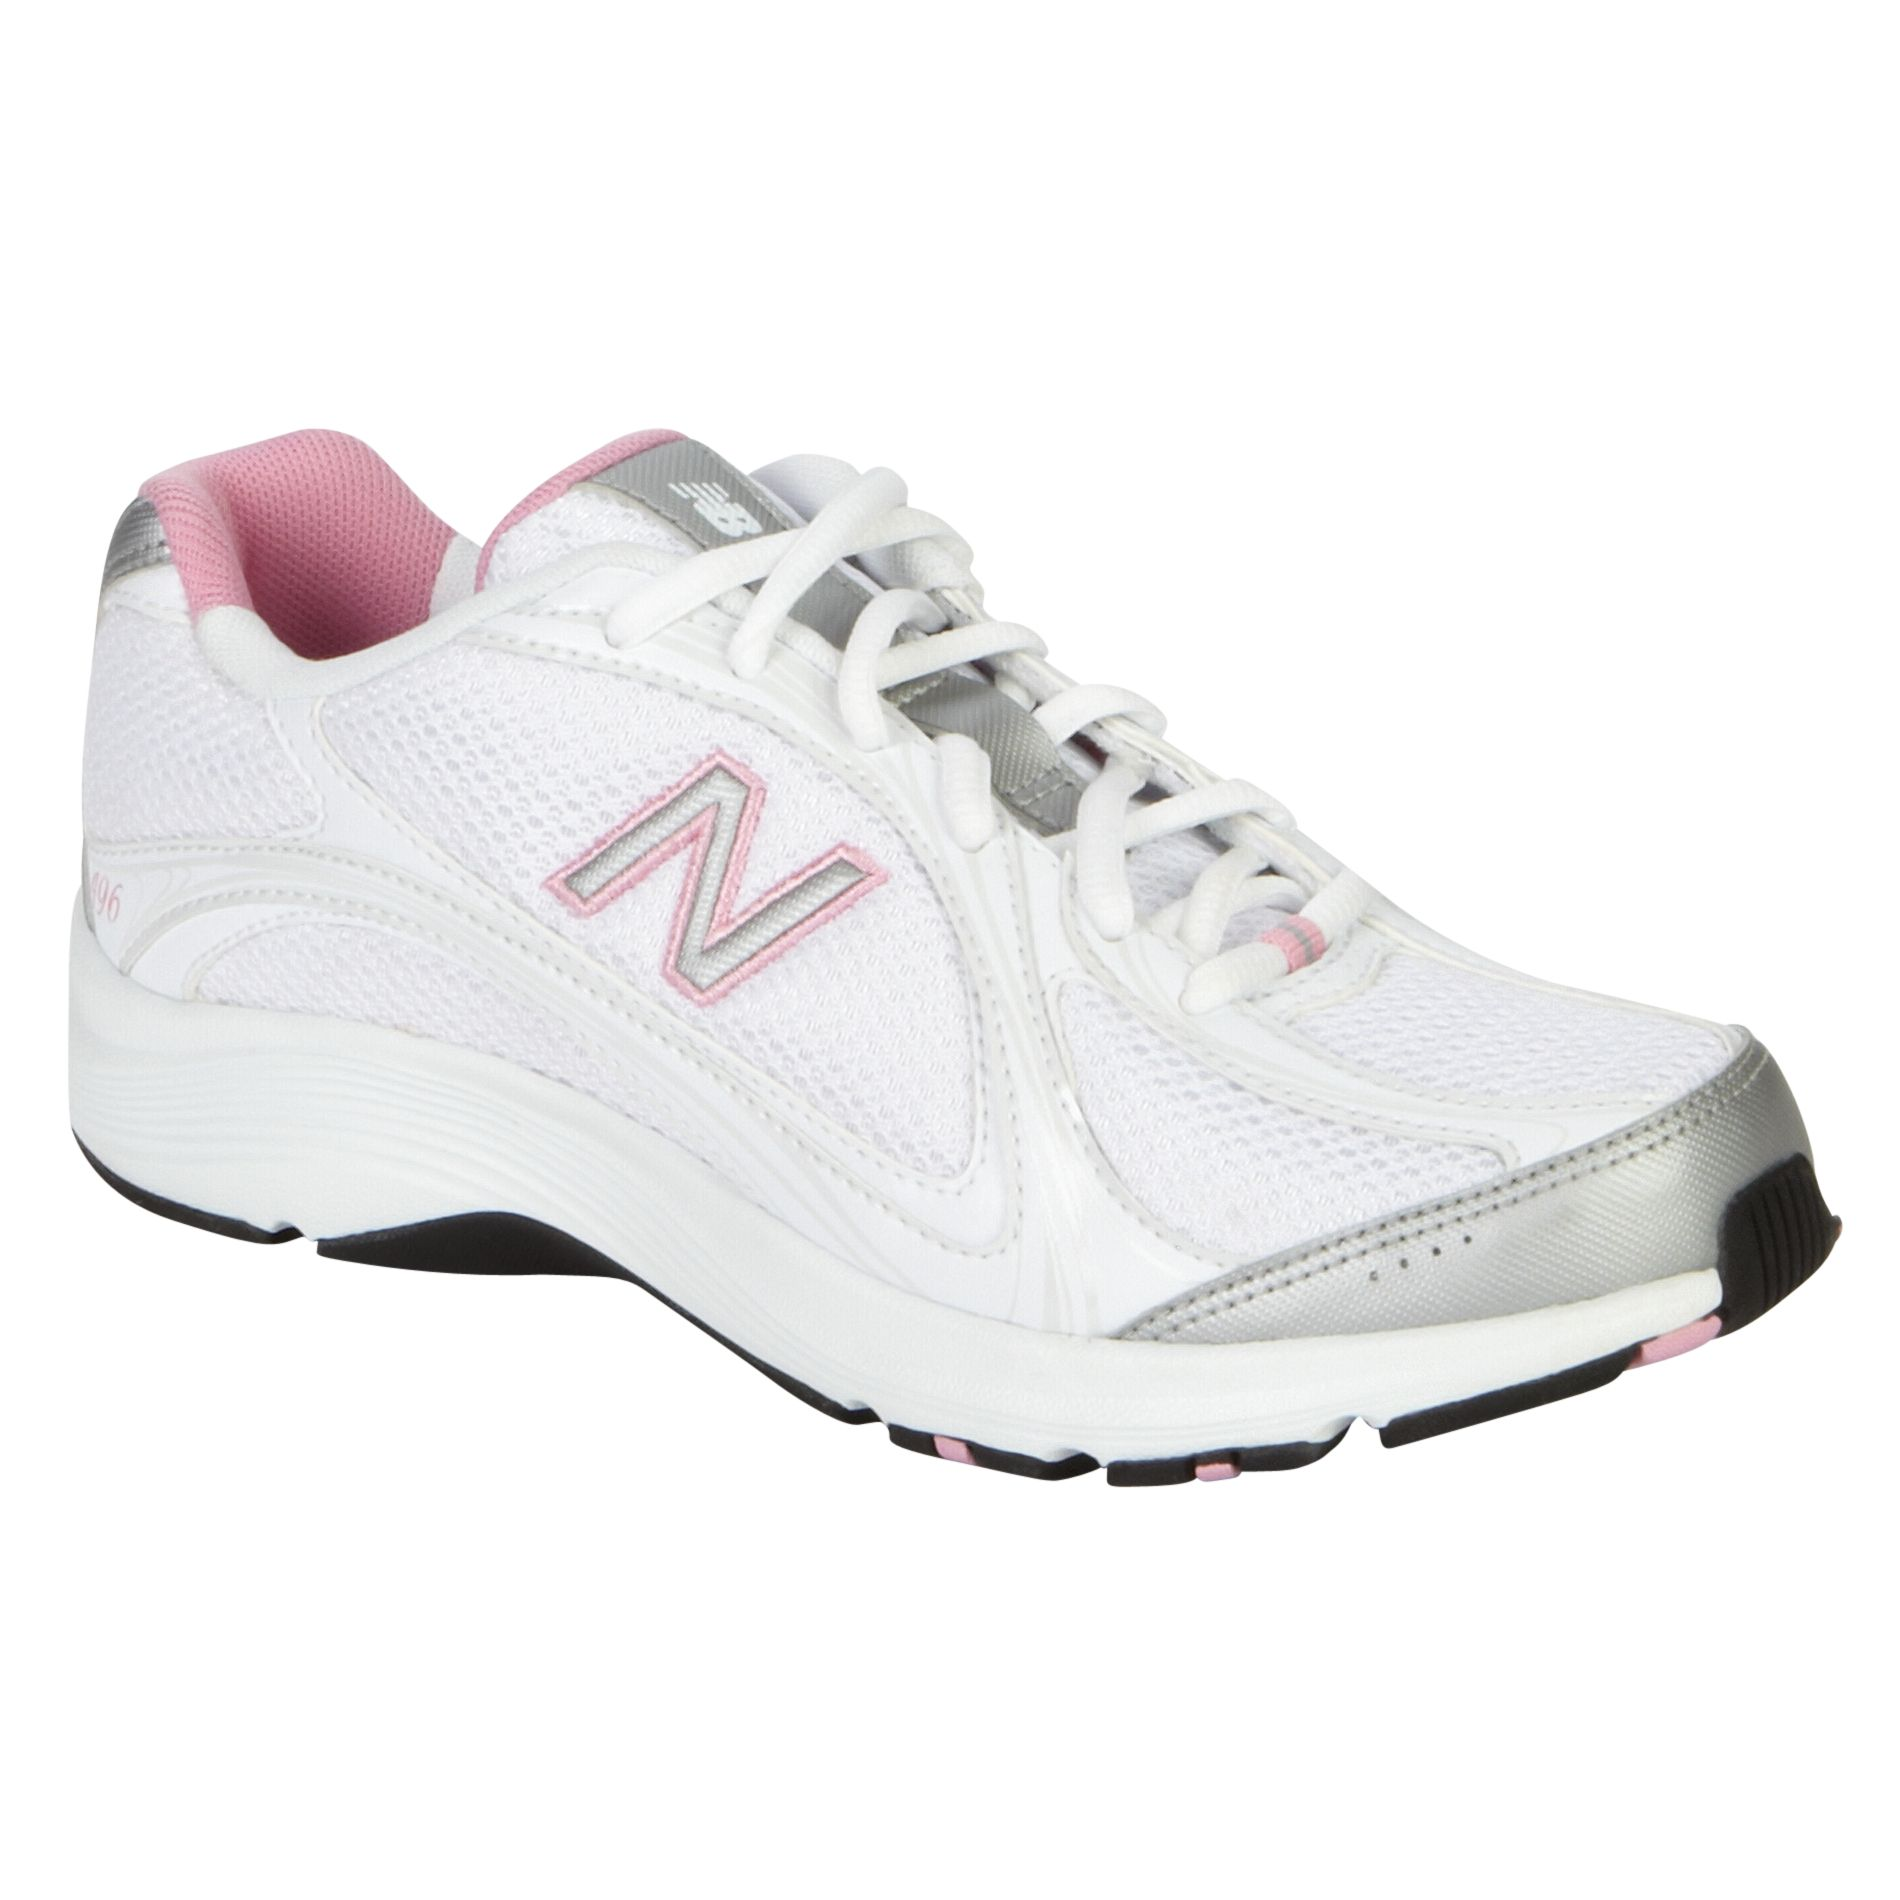 New Balance Womens  White Walking Shoes